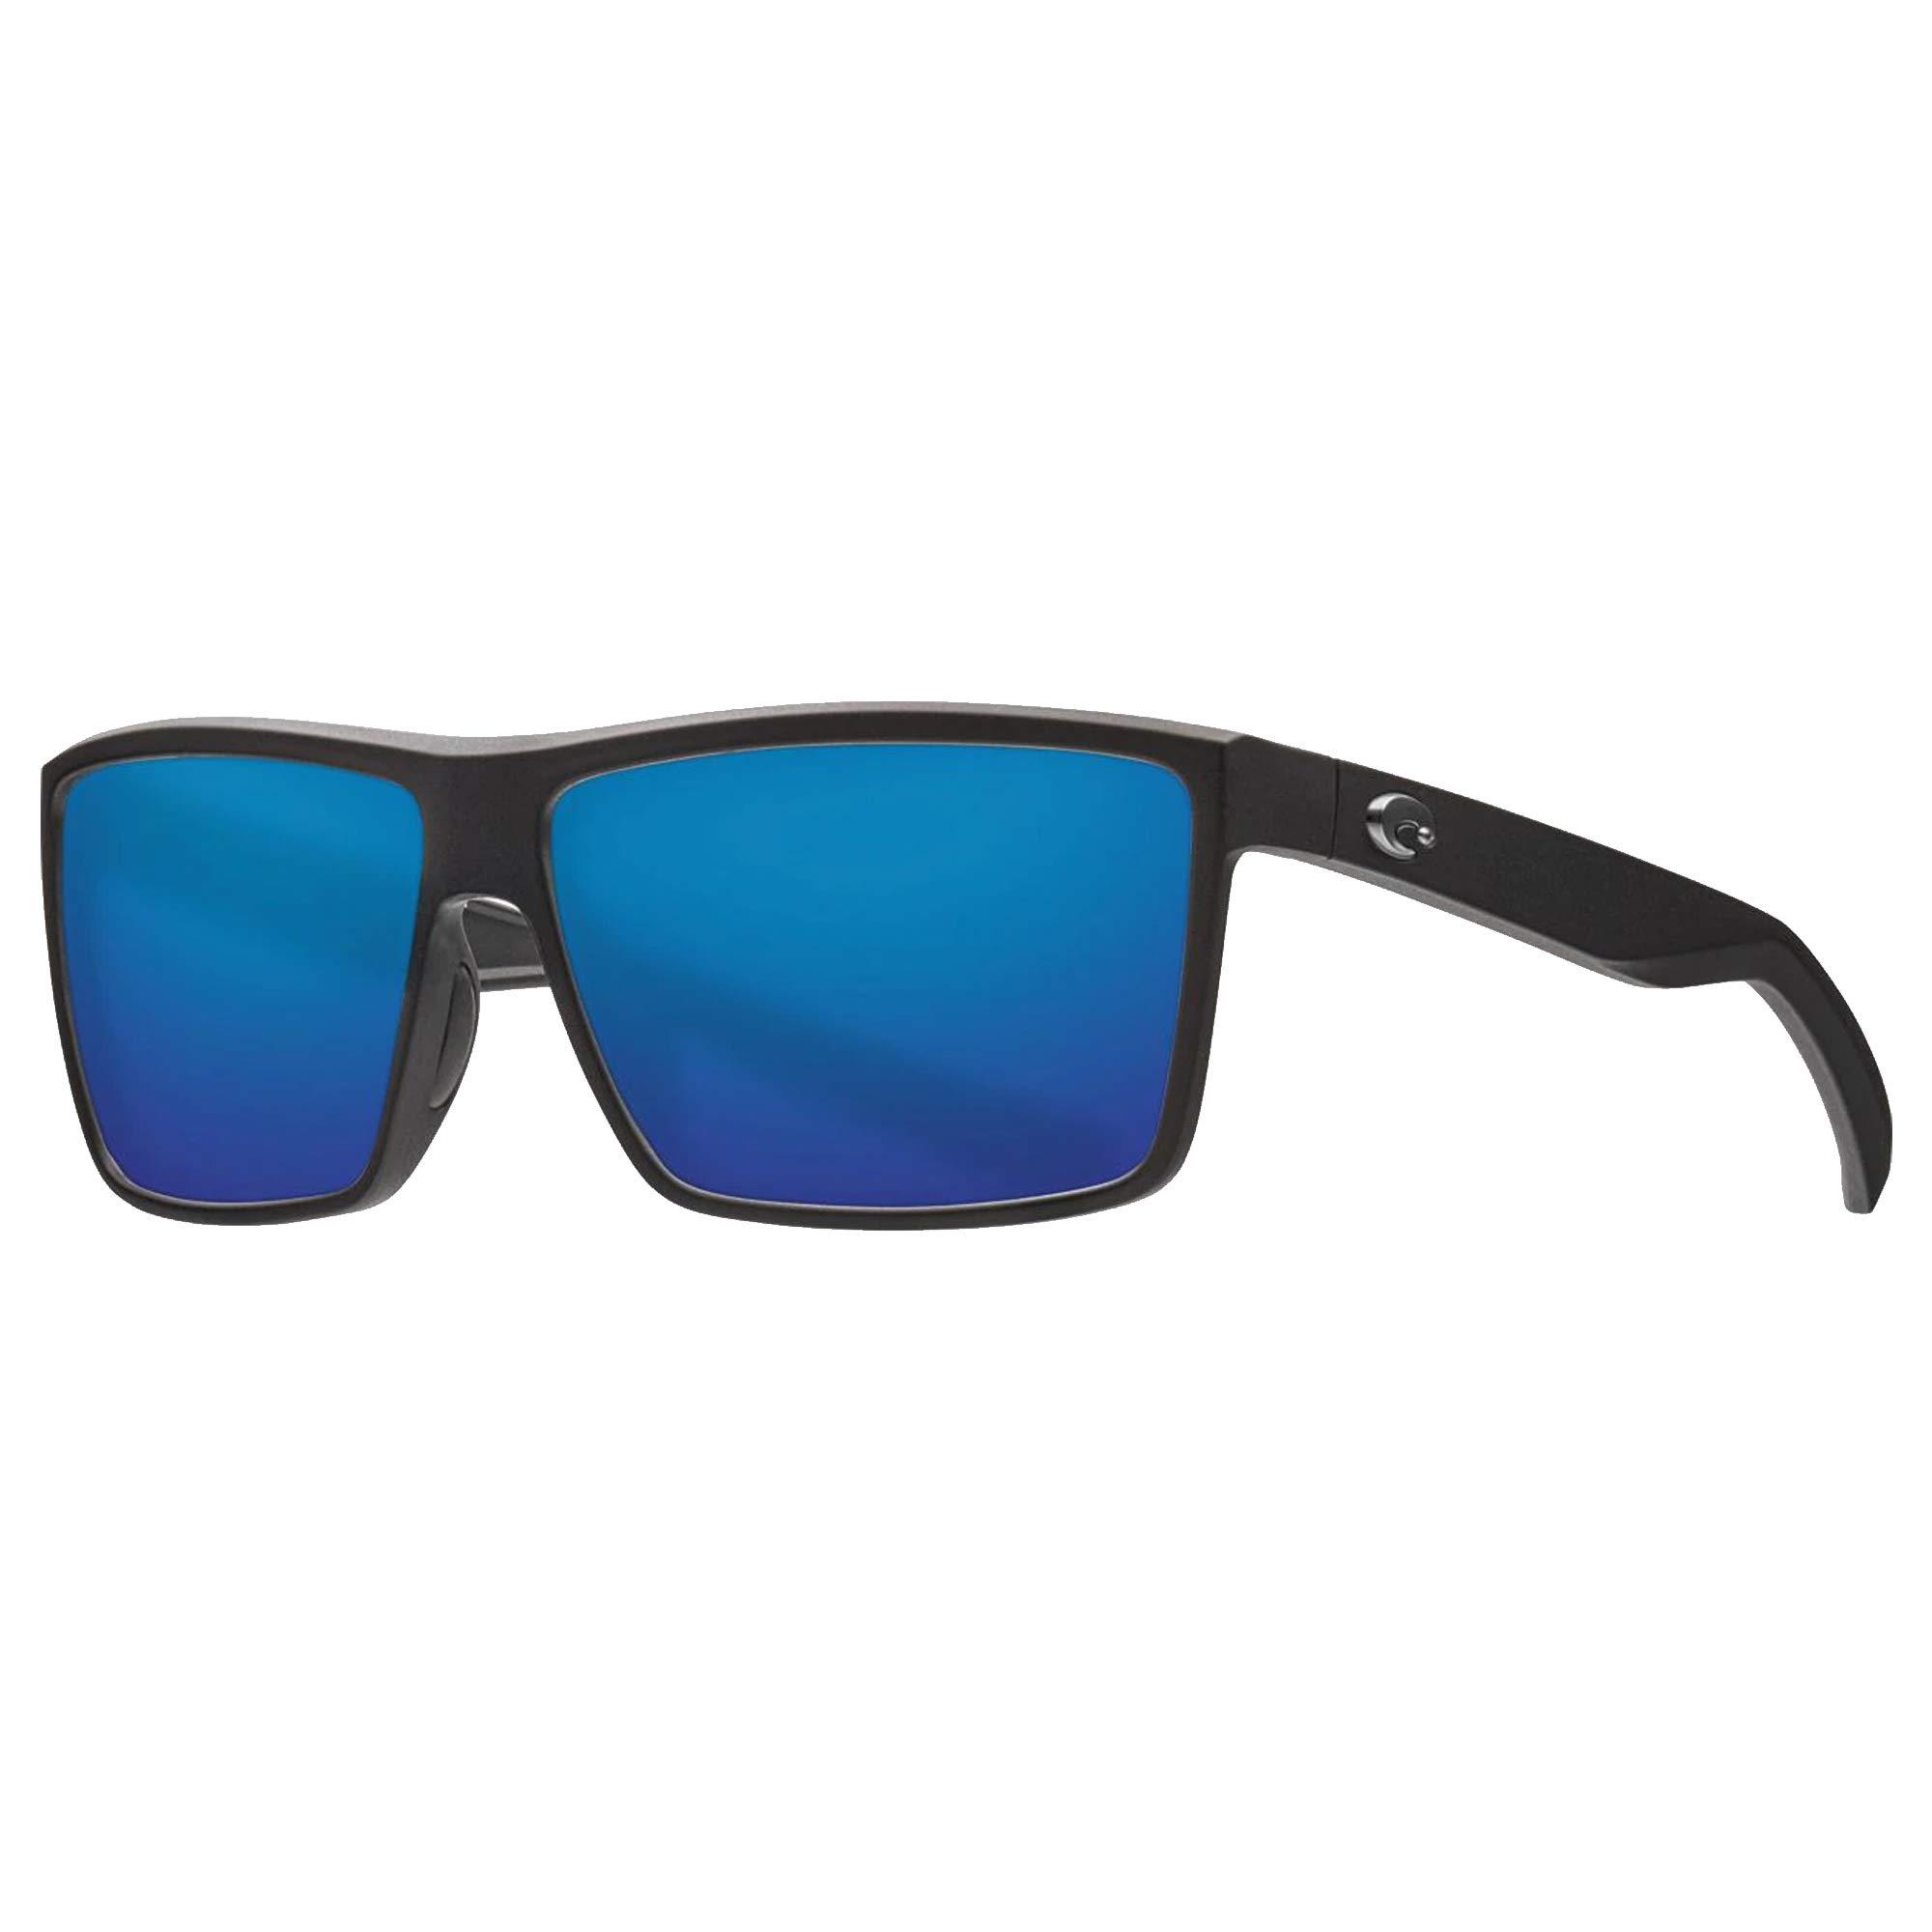 Costa Rinconcito Matte Black Plastic Frame Blue Mirror Lens Unisex Sunglasses RIC11OBMP